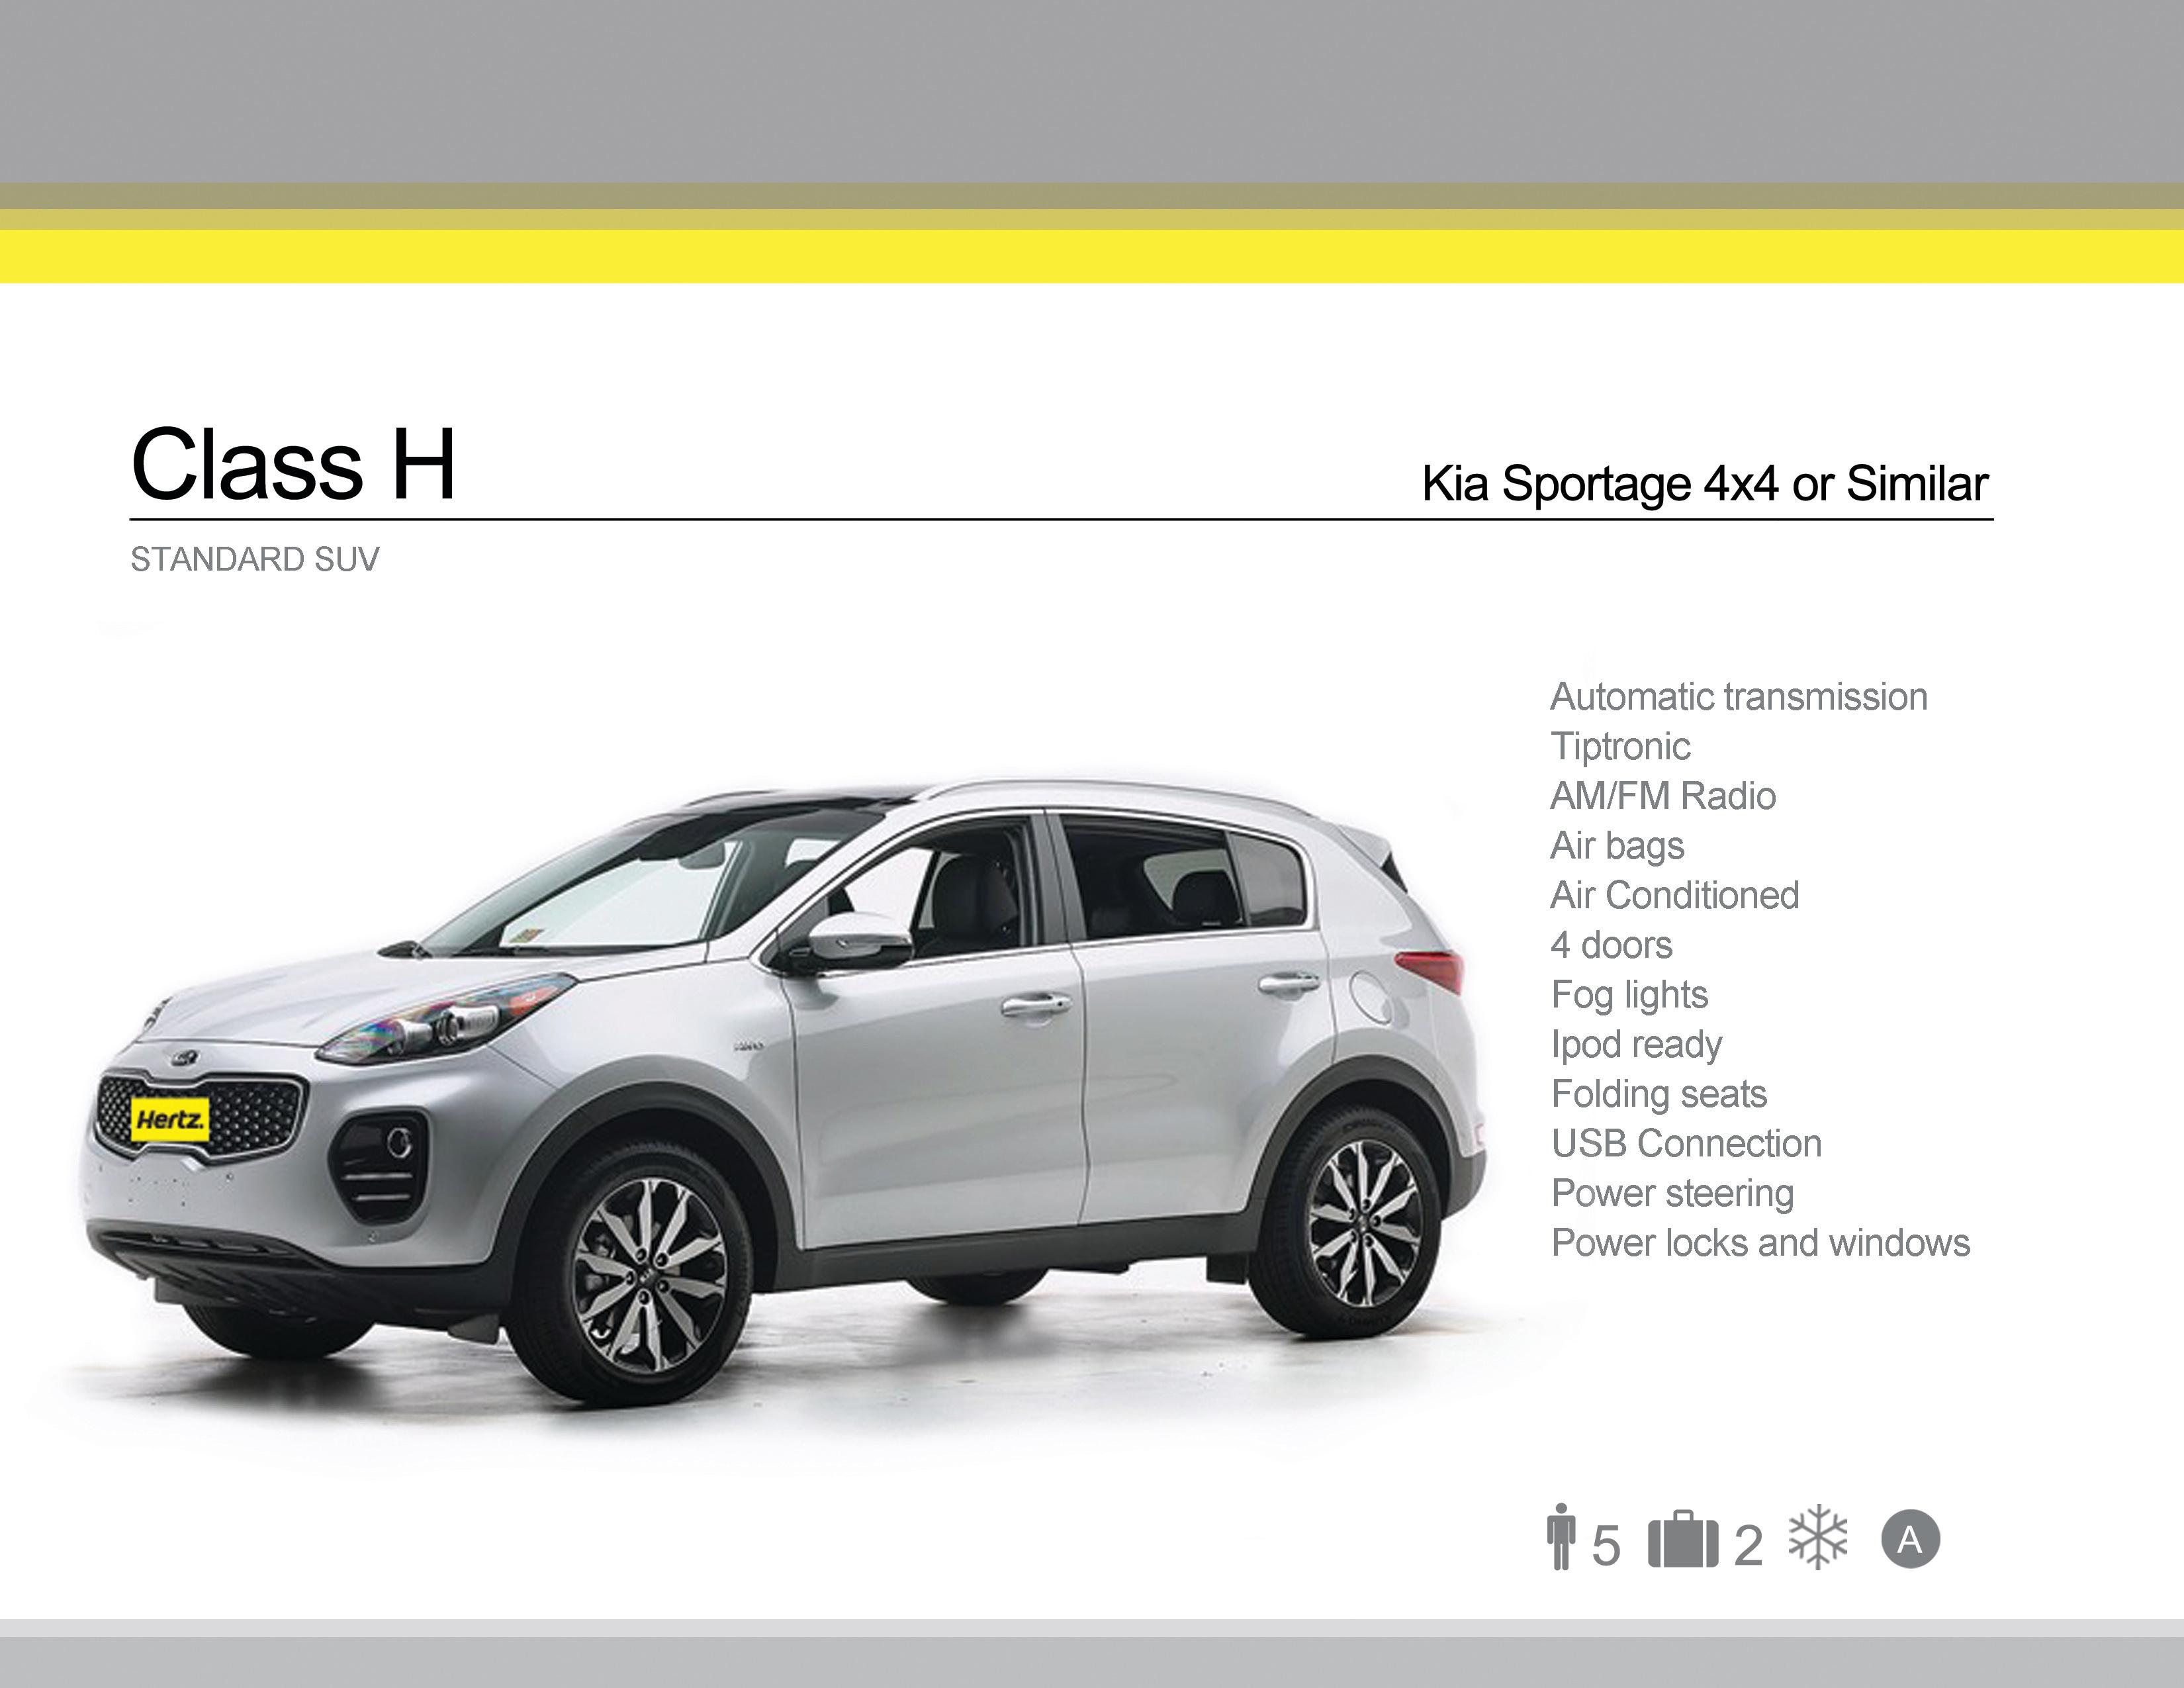 Class H - Kia Sportage or Similar